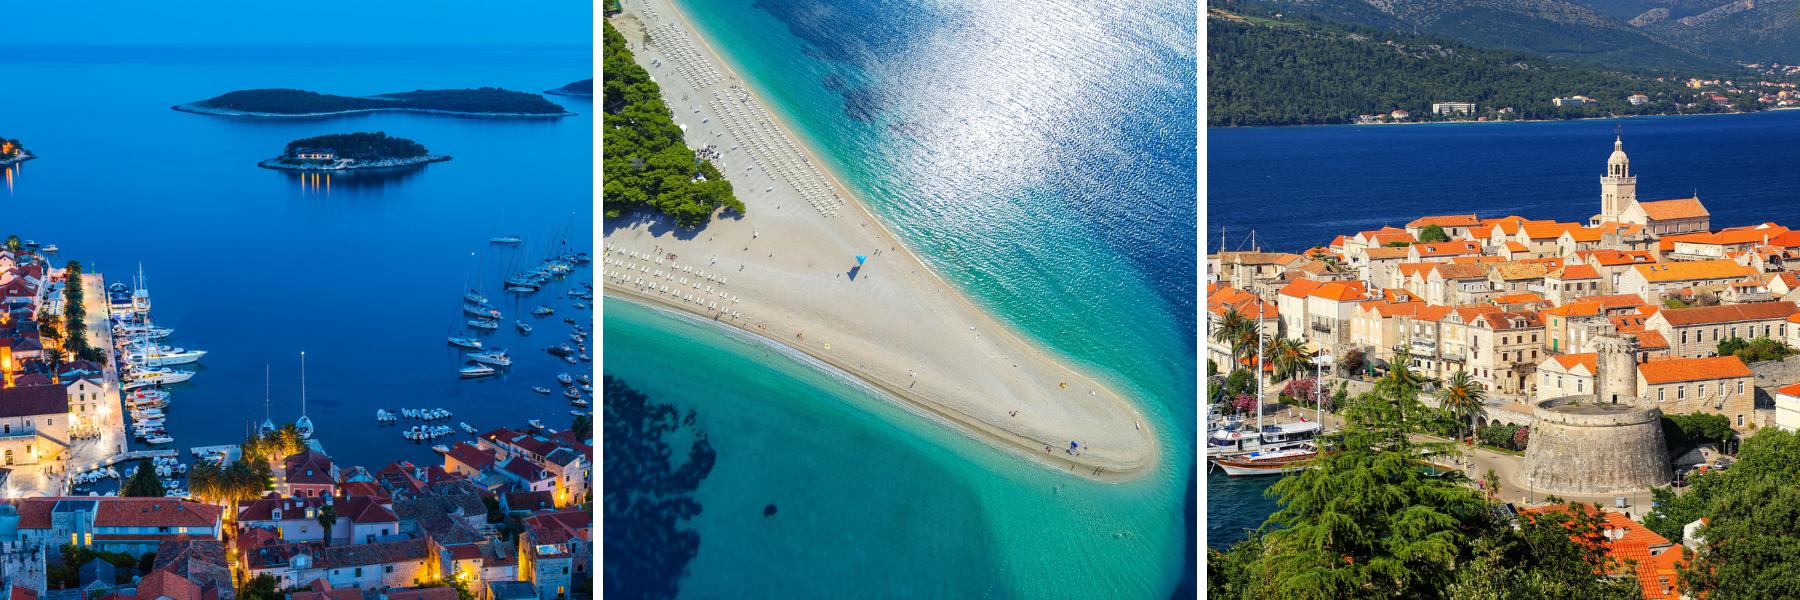 Unforgettable Croatia, Hvar, Brac, Korcula